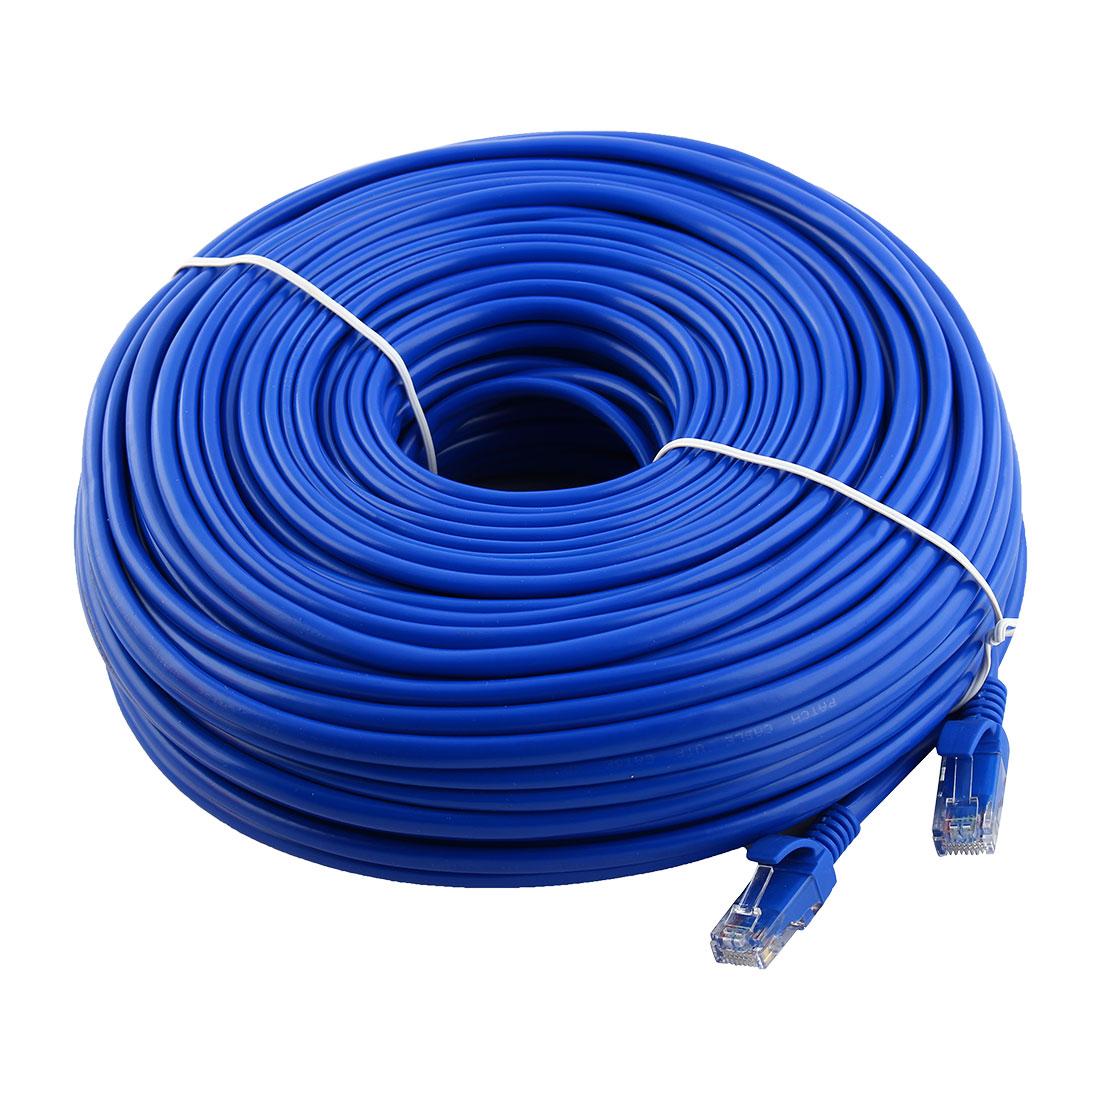 164FT 164 FT RJ45 CAT5 CAT 5E CAT5E Ethernet LAN Network Cable Blue